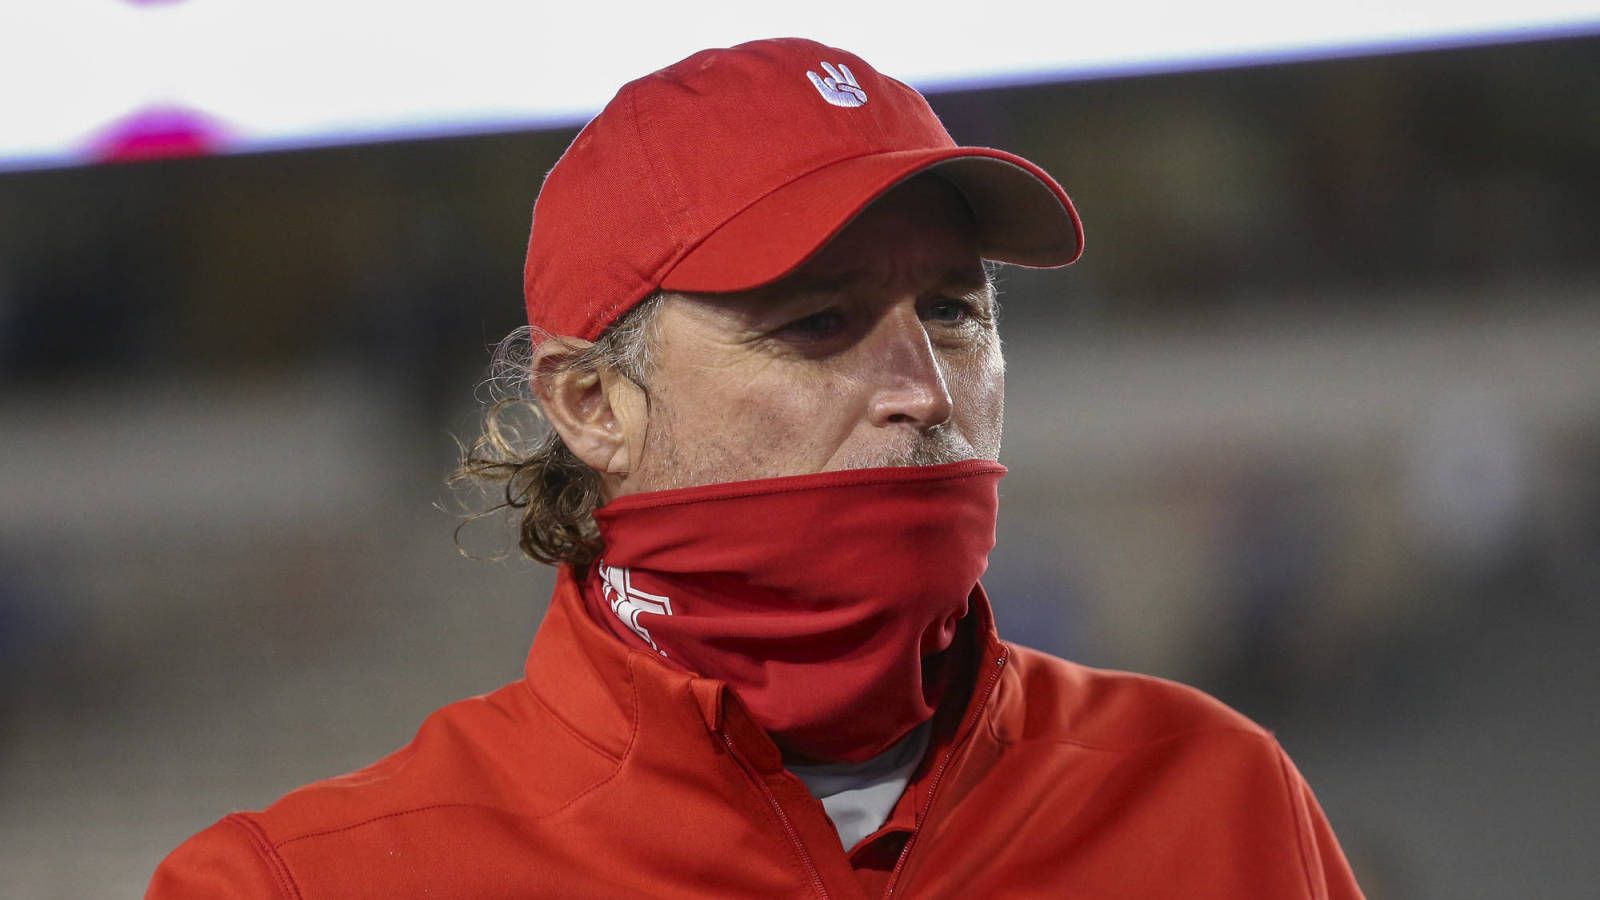 Houston-smu-football-game-postponed-again-due